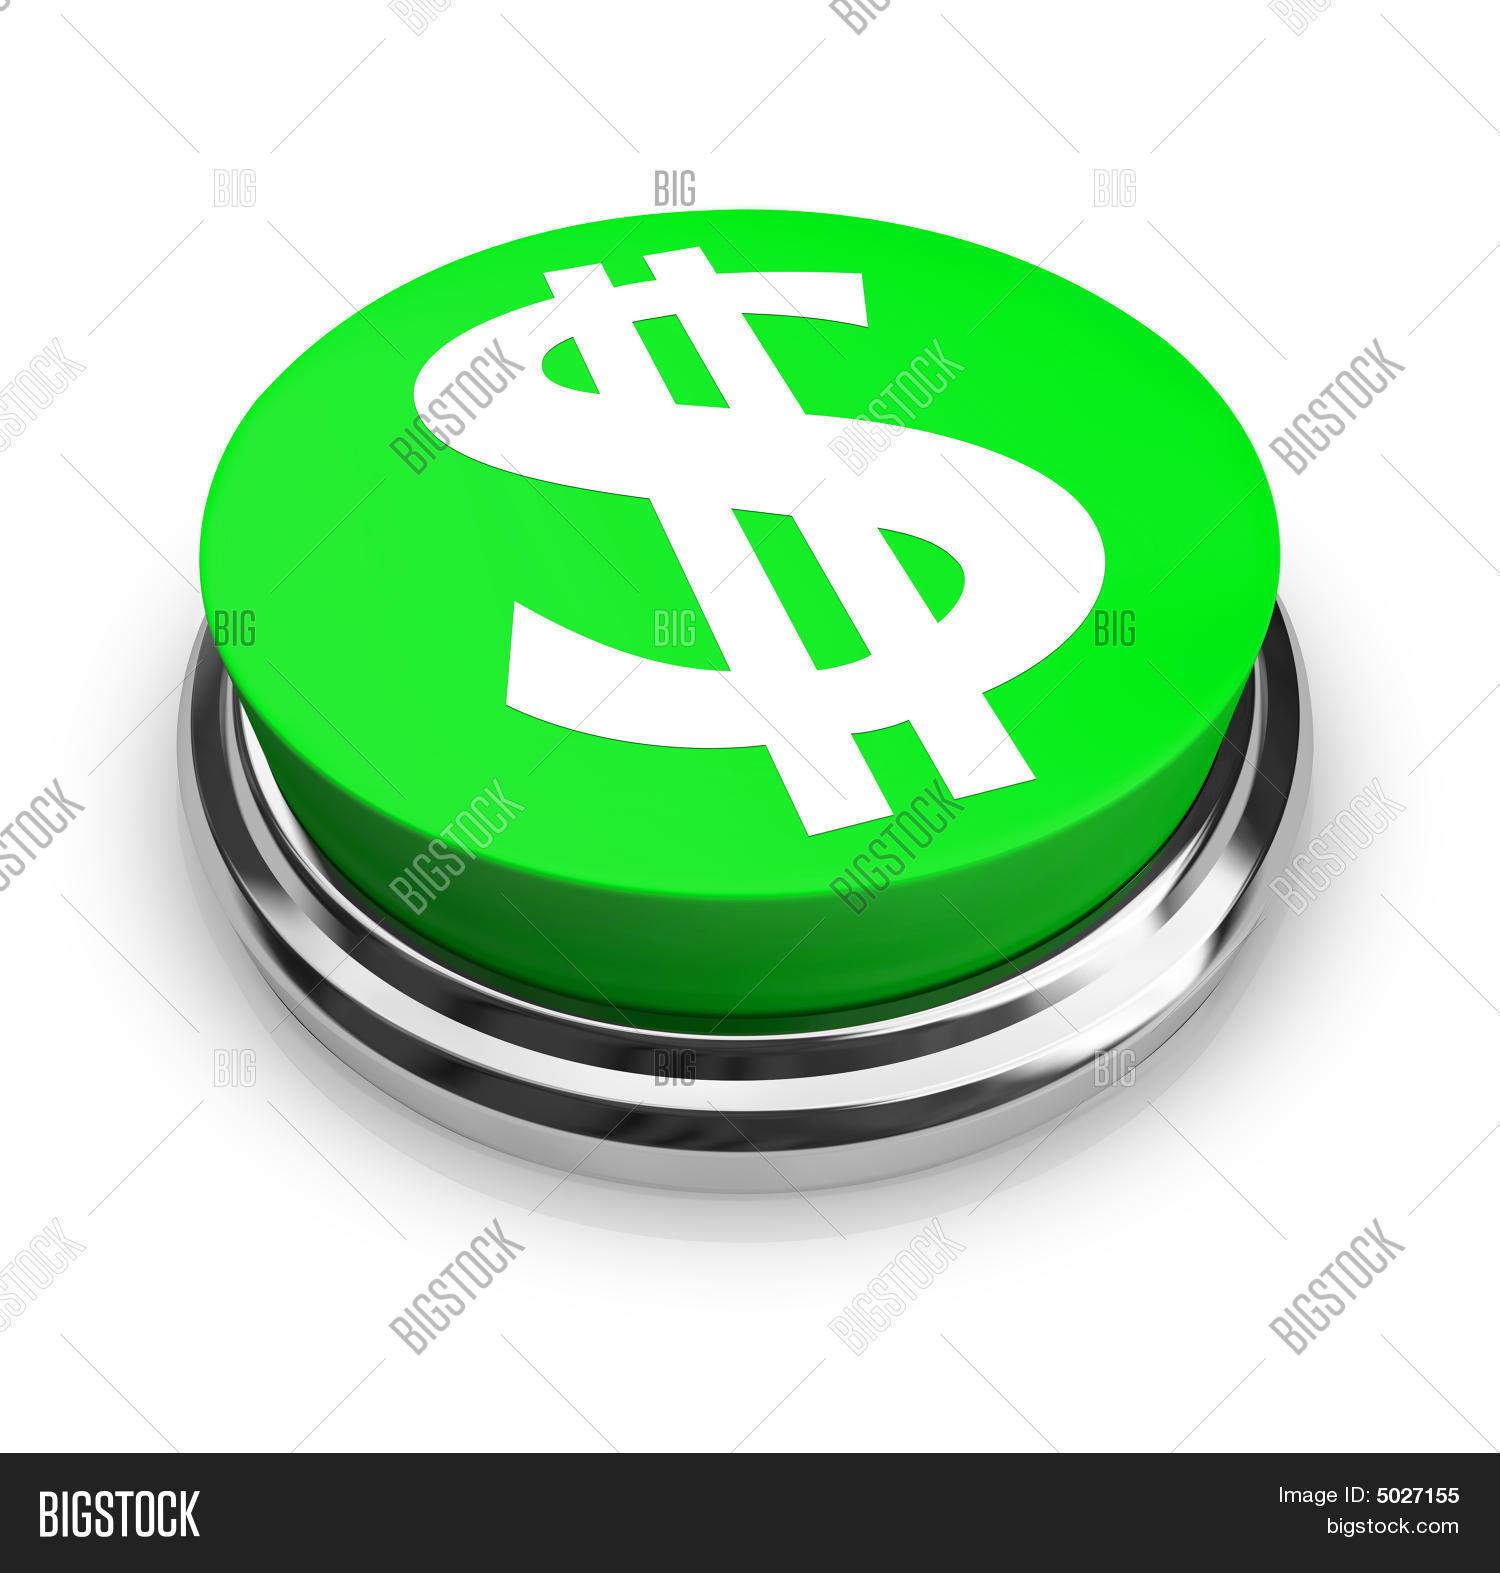 Us Dollar Symbol Image Photo Free Trial Bigstock